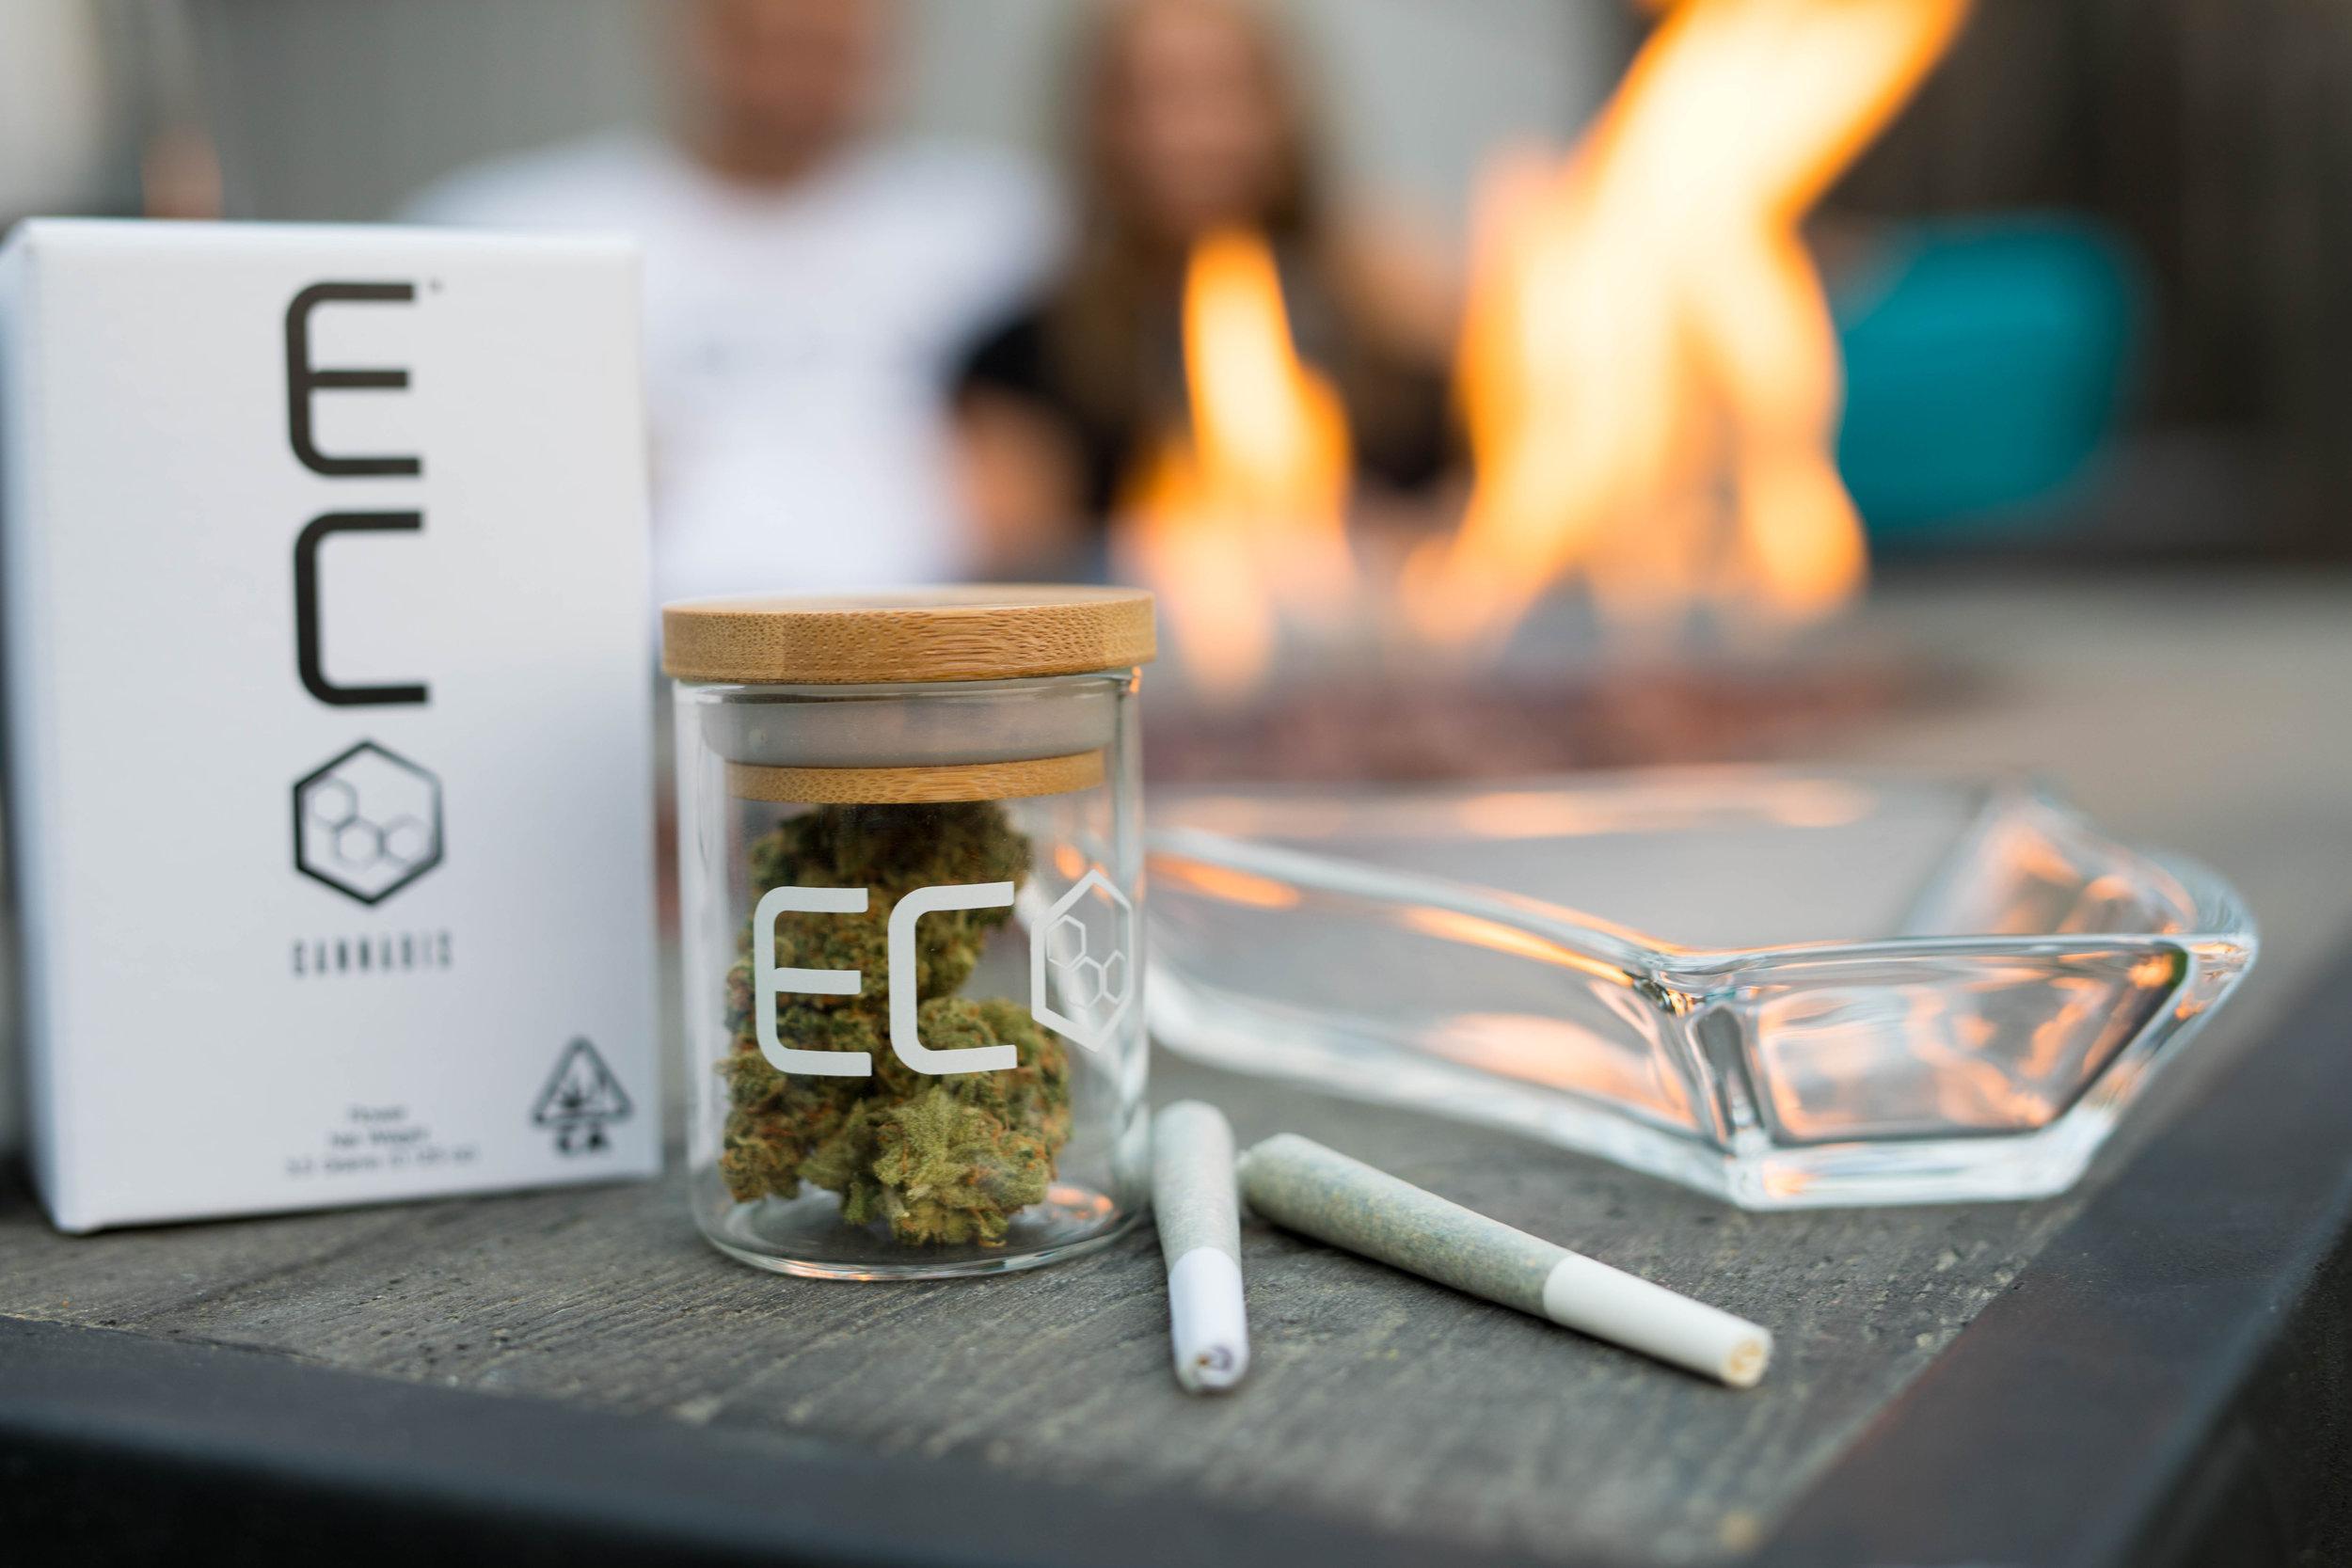 ECO Cannabis Flower